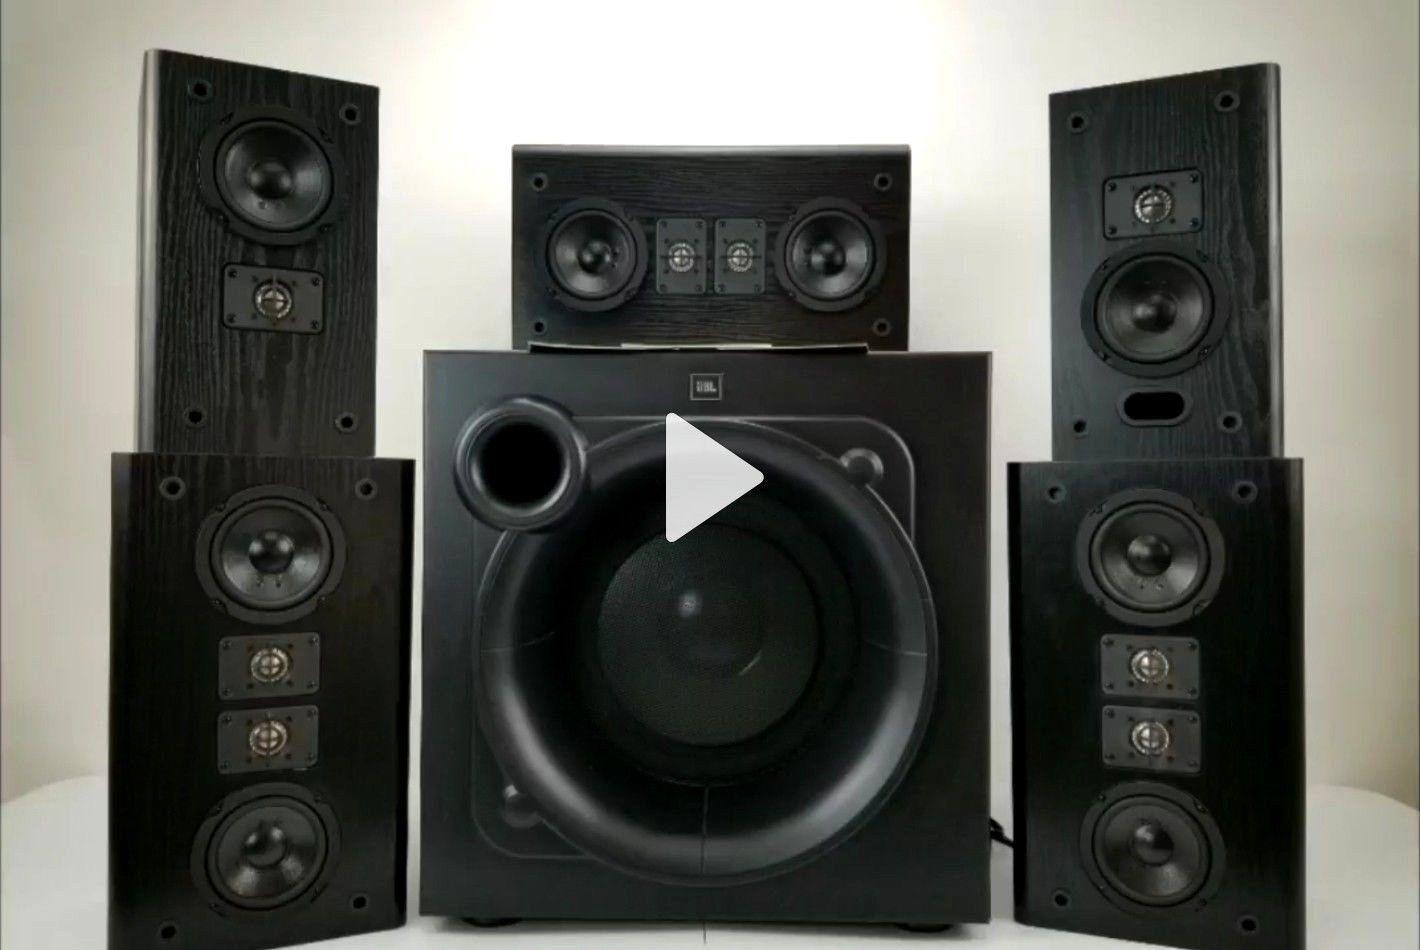 Super Clean JBL THX Certified HT Series Surround Sound System - WATCH VIDEO